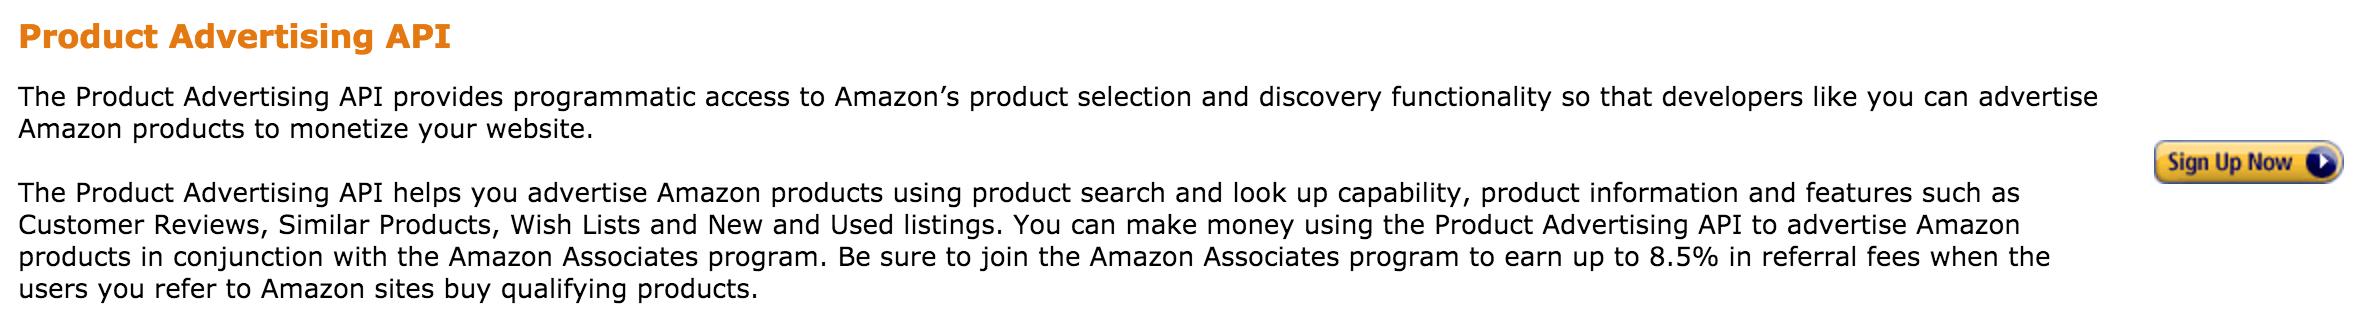 AAWP - Amazon Affiliate WordPress Plugin - Docs - Signup Amazon API